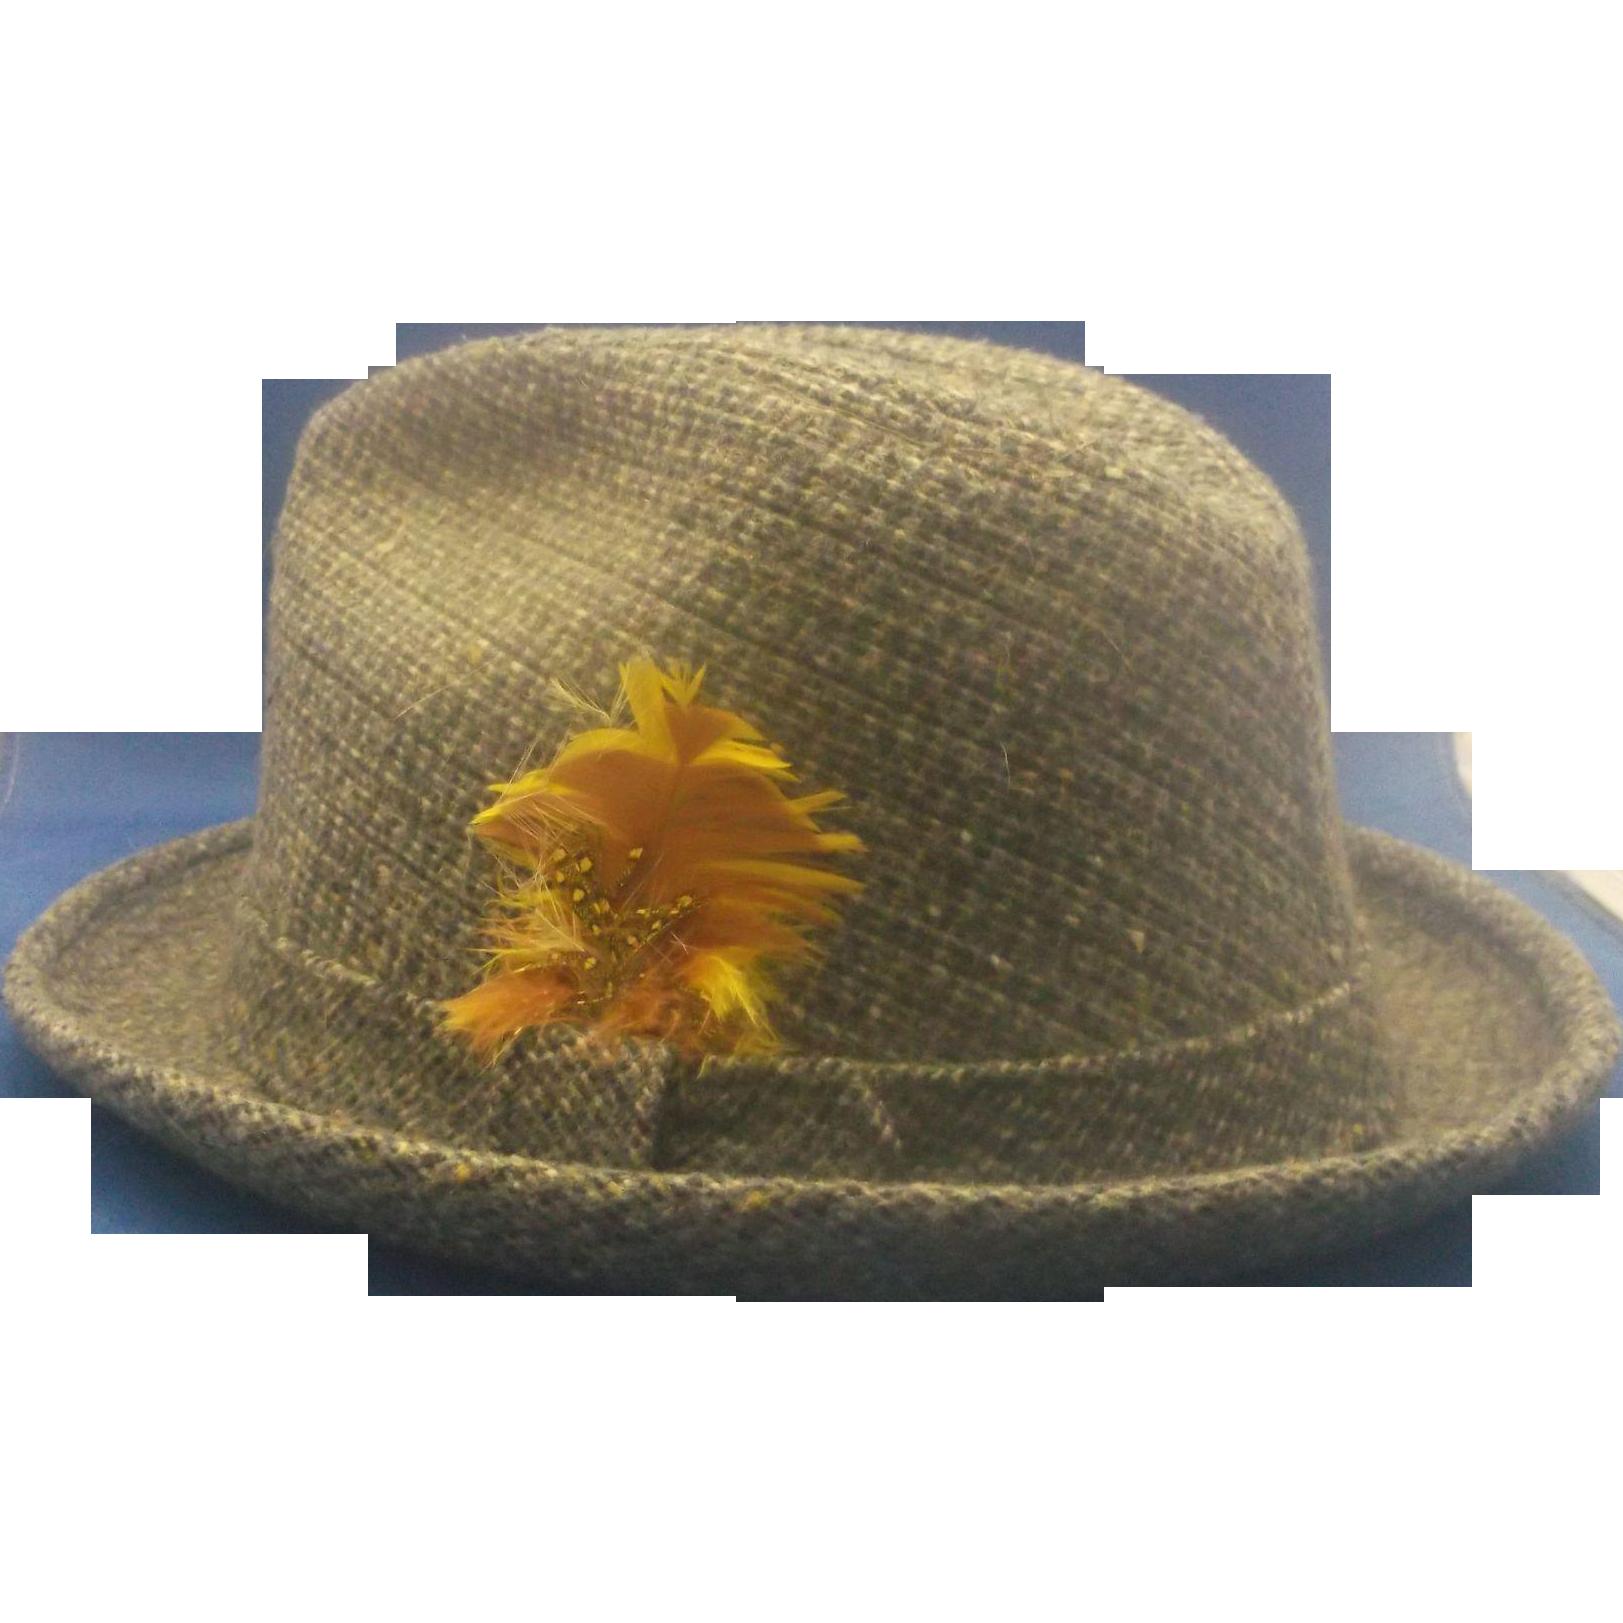 Stetson Equalizer Men's Fedora Tweed Hat Size XL